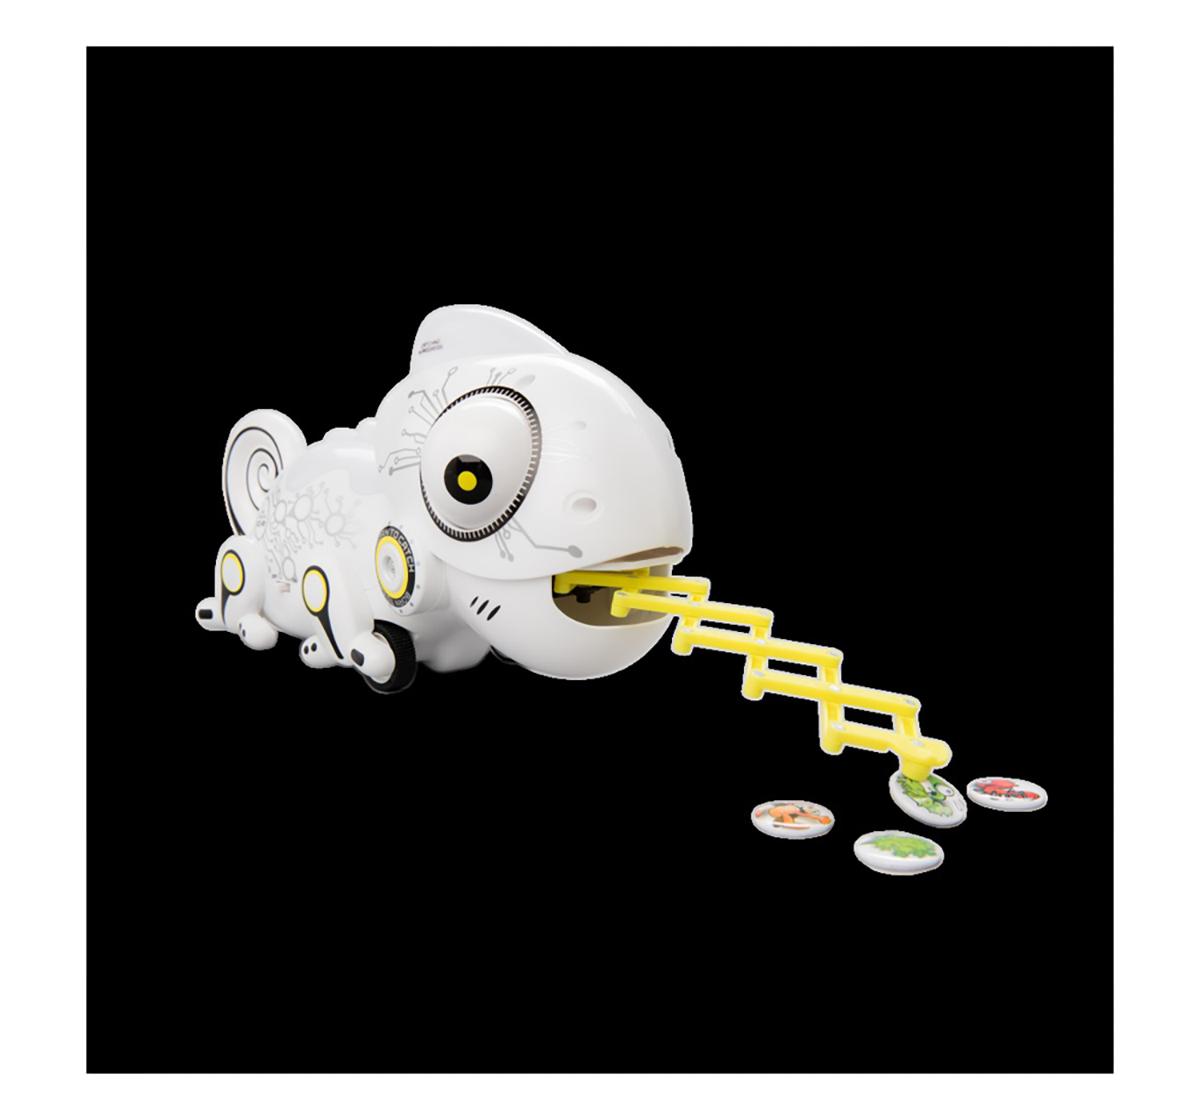 Silverlit | Silverlit Robo Chameleon White Robotics for Kids age 3Y+ (White)